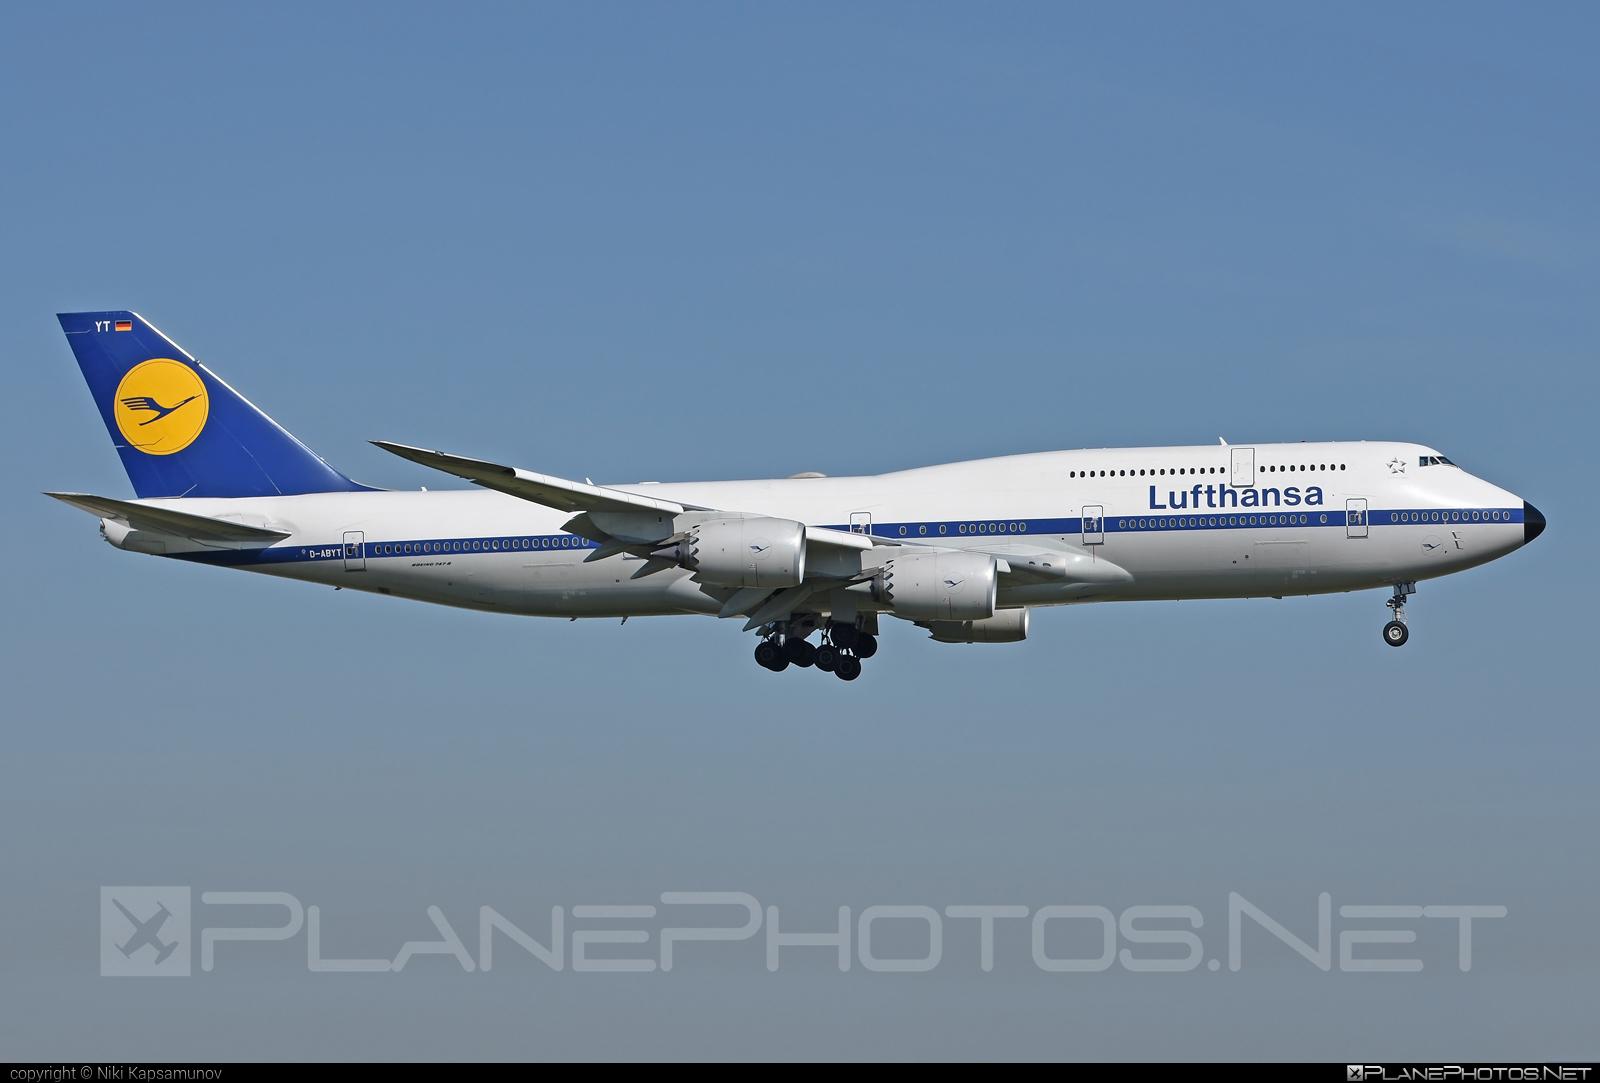 Boeing 747-8 - D-ABYT operated by Lufthansa #b747 #boeing #boeing747 #jumbo #lufthansa